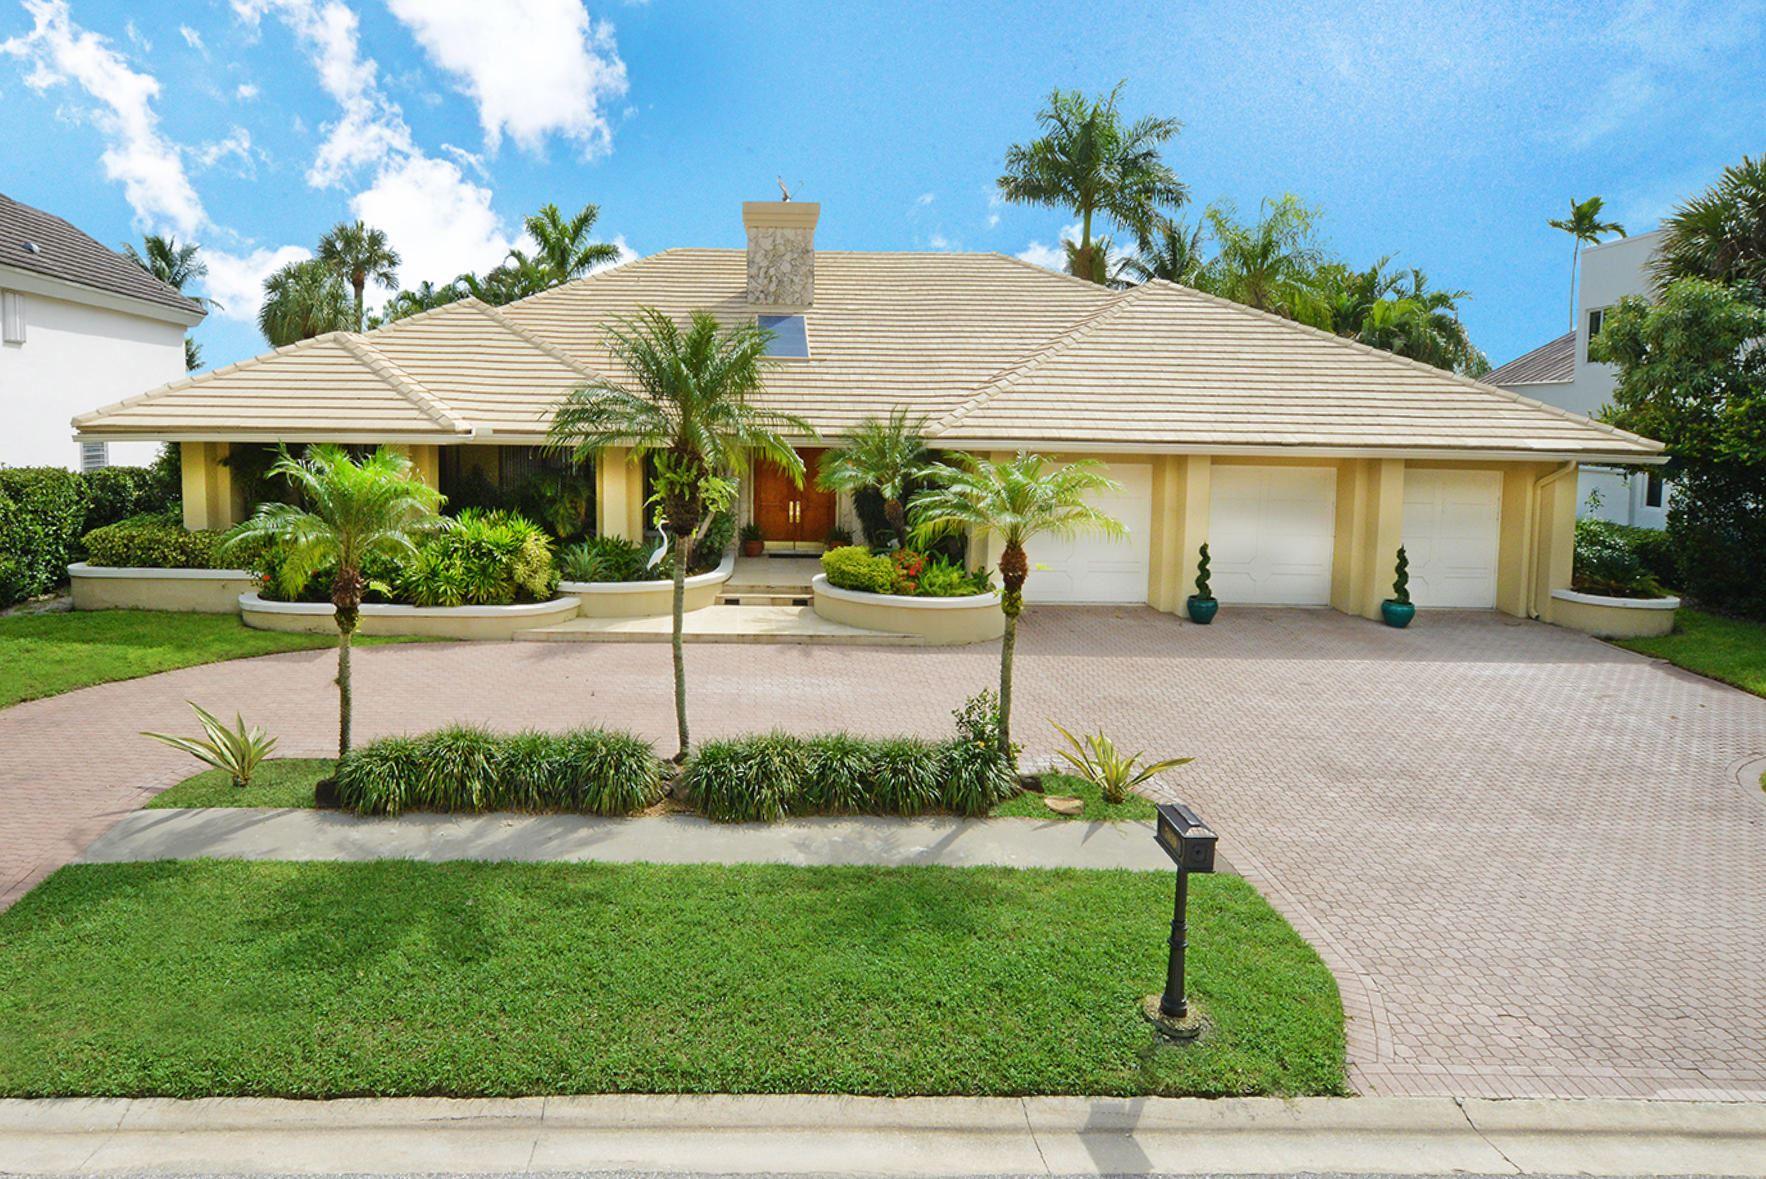 7859 Mandarin Drive, Boca Raton, FL 33433 - #: RX-10665782